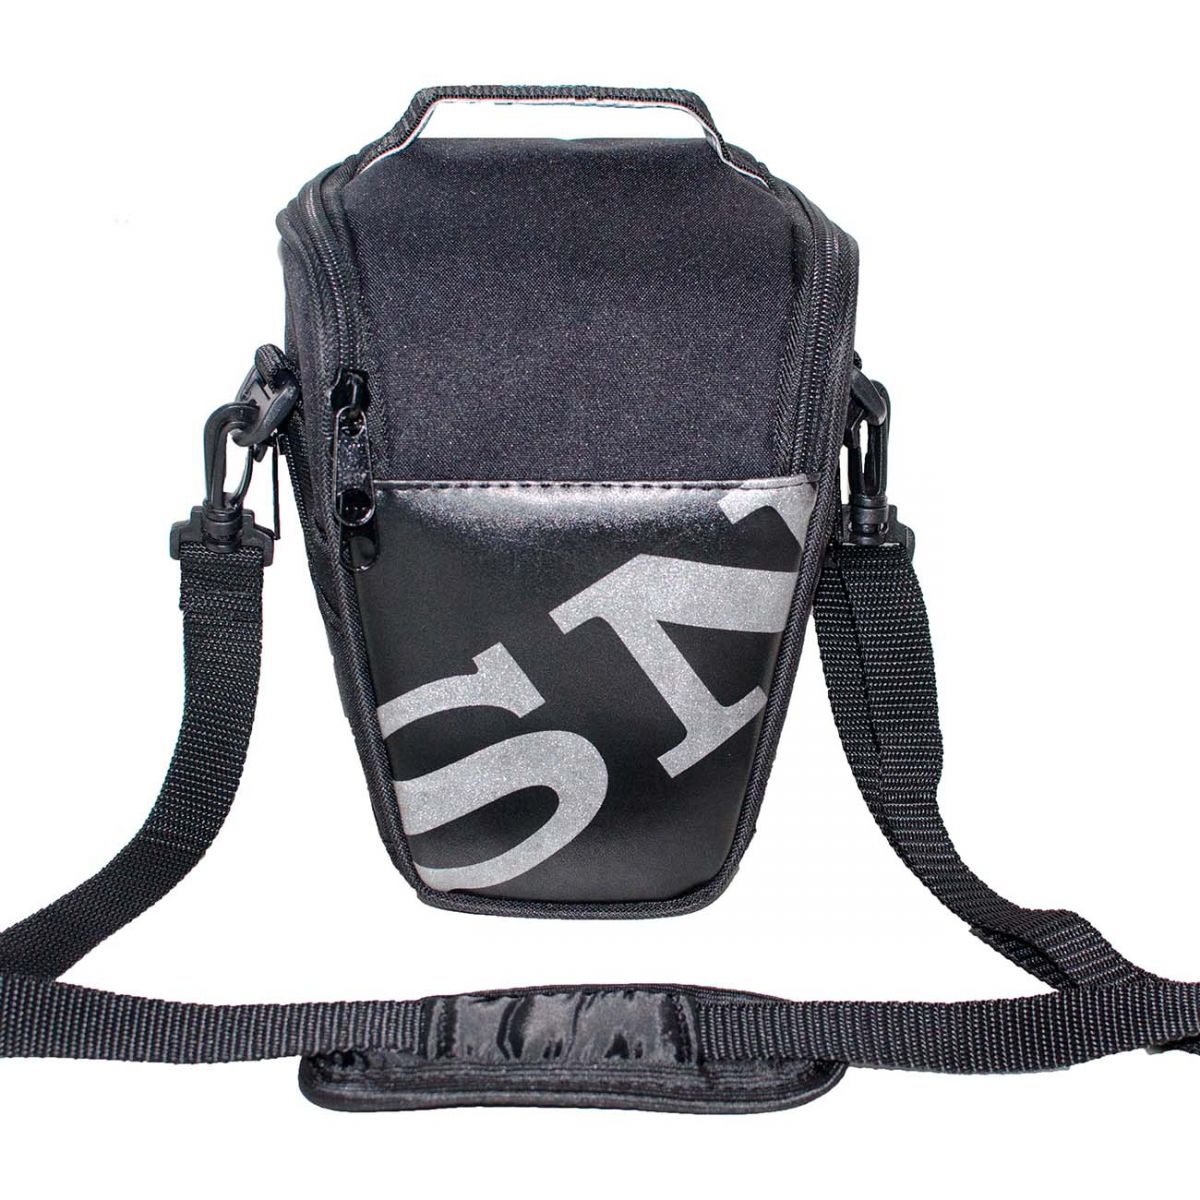 8c9fcfafb5 Bolsa Fotográfica SN para bolsas Sony Profissionais